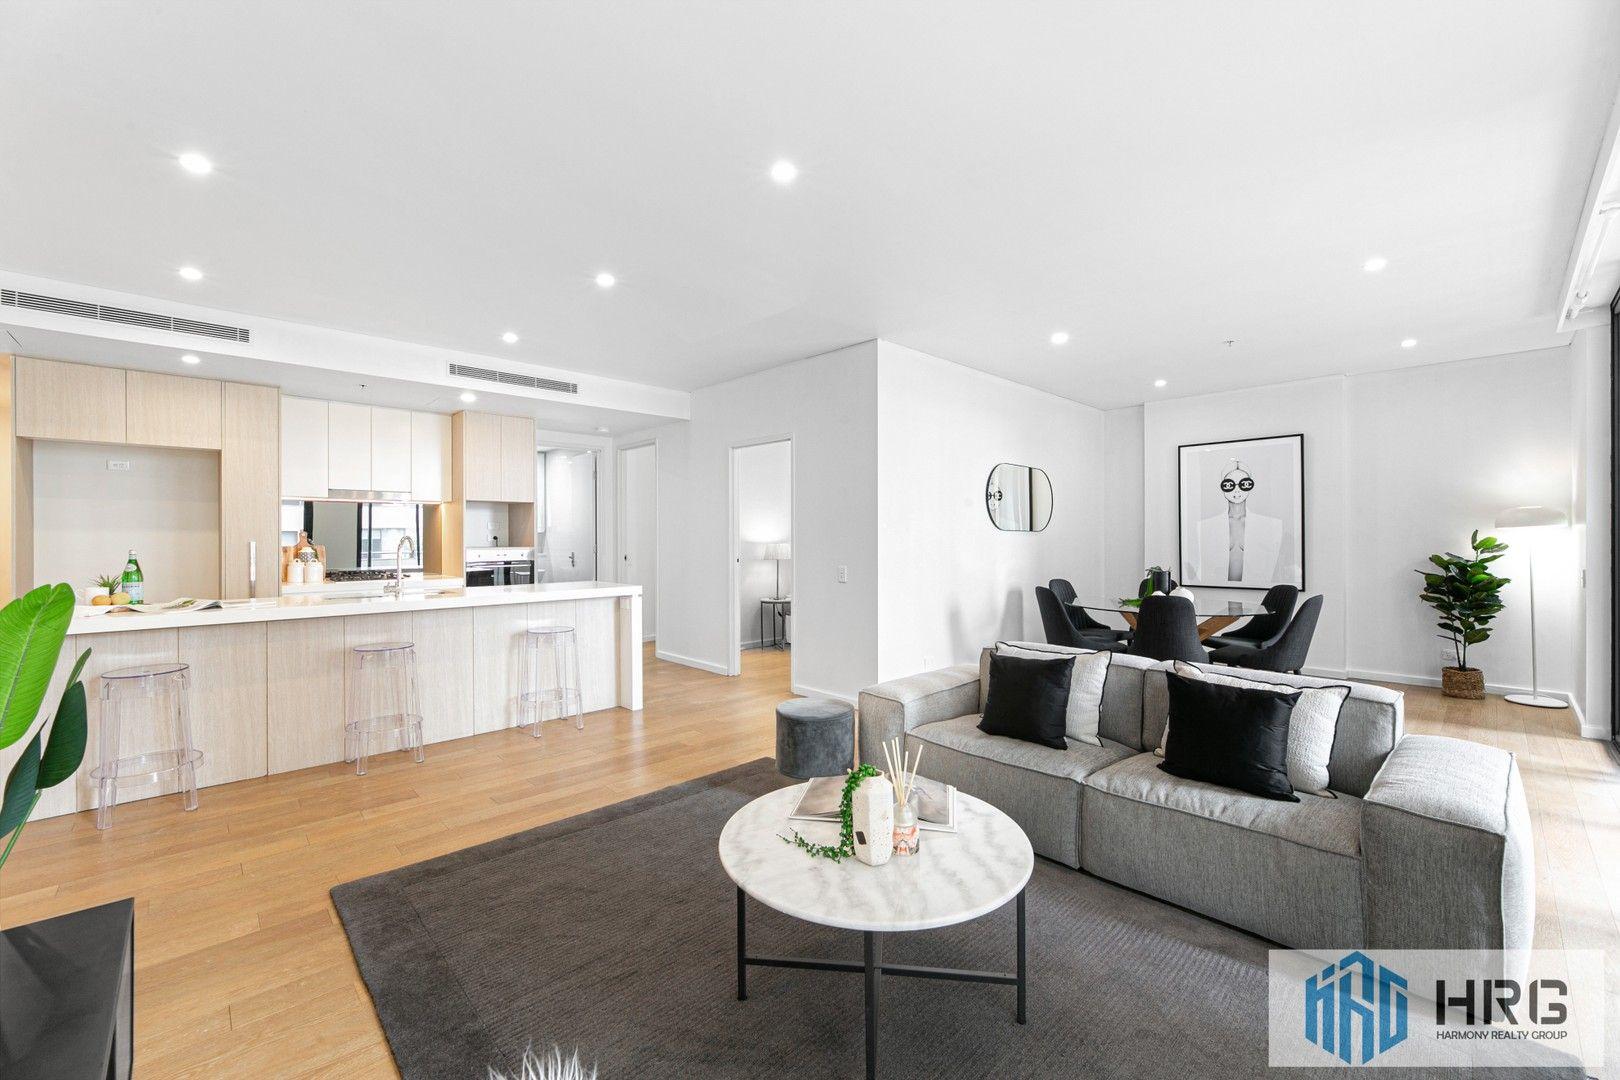 3 bedrooms Apartment / Unit / Flat in 203c/1 Muller Lane MASCOT NSW, 2020